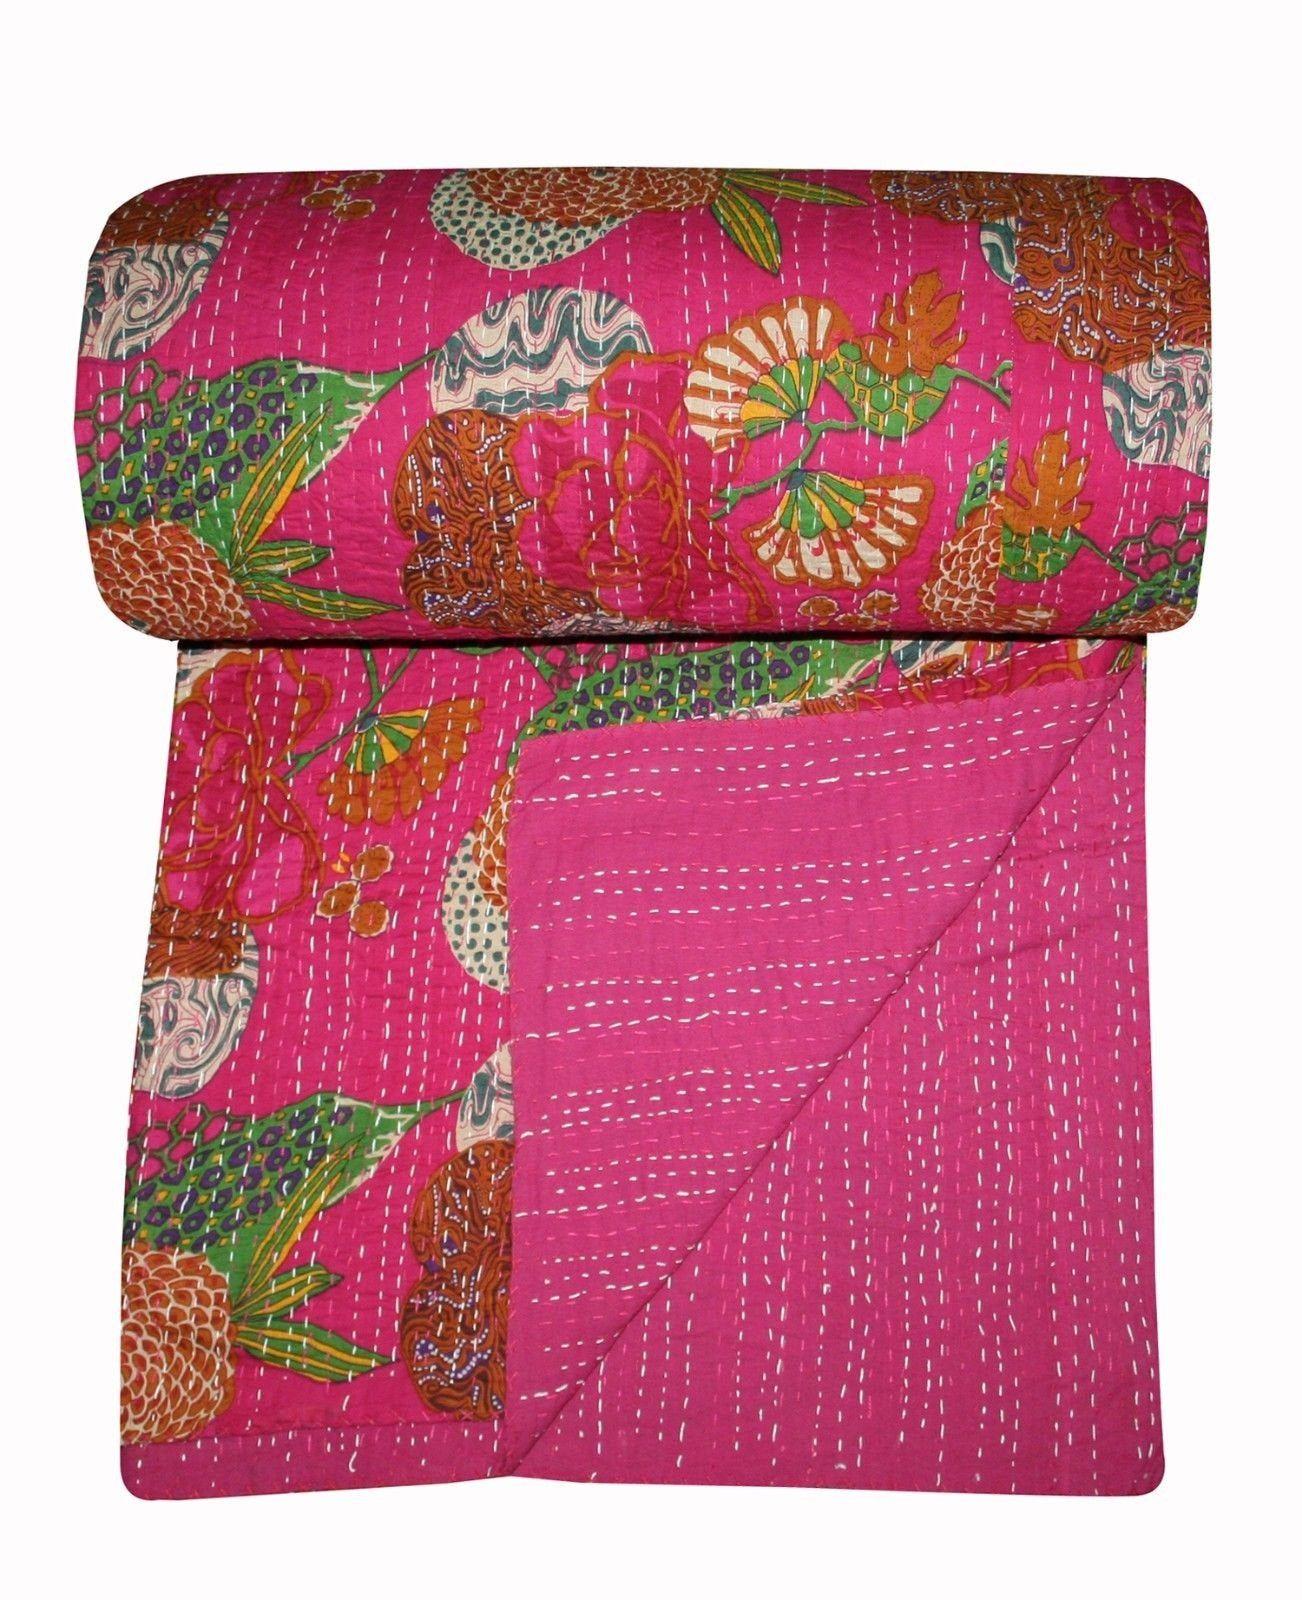 Fair Trade Kantha Throw Queen Size Reversible Kantha Blanket Handmade Kantha Bedding For Dorm Room Applique Baby Kantha Coverlet Quilt Kantha Quilt Queen Quilt